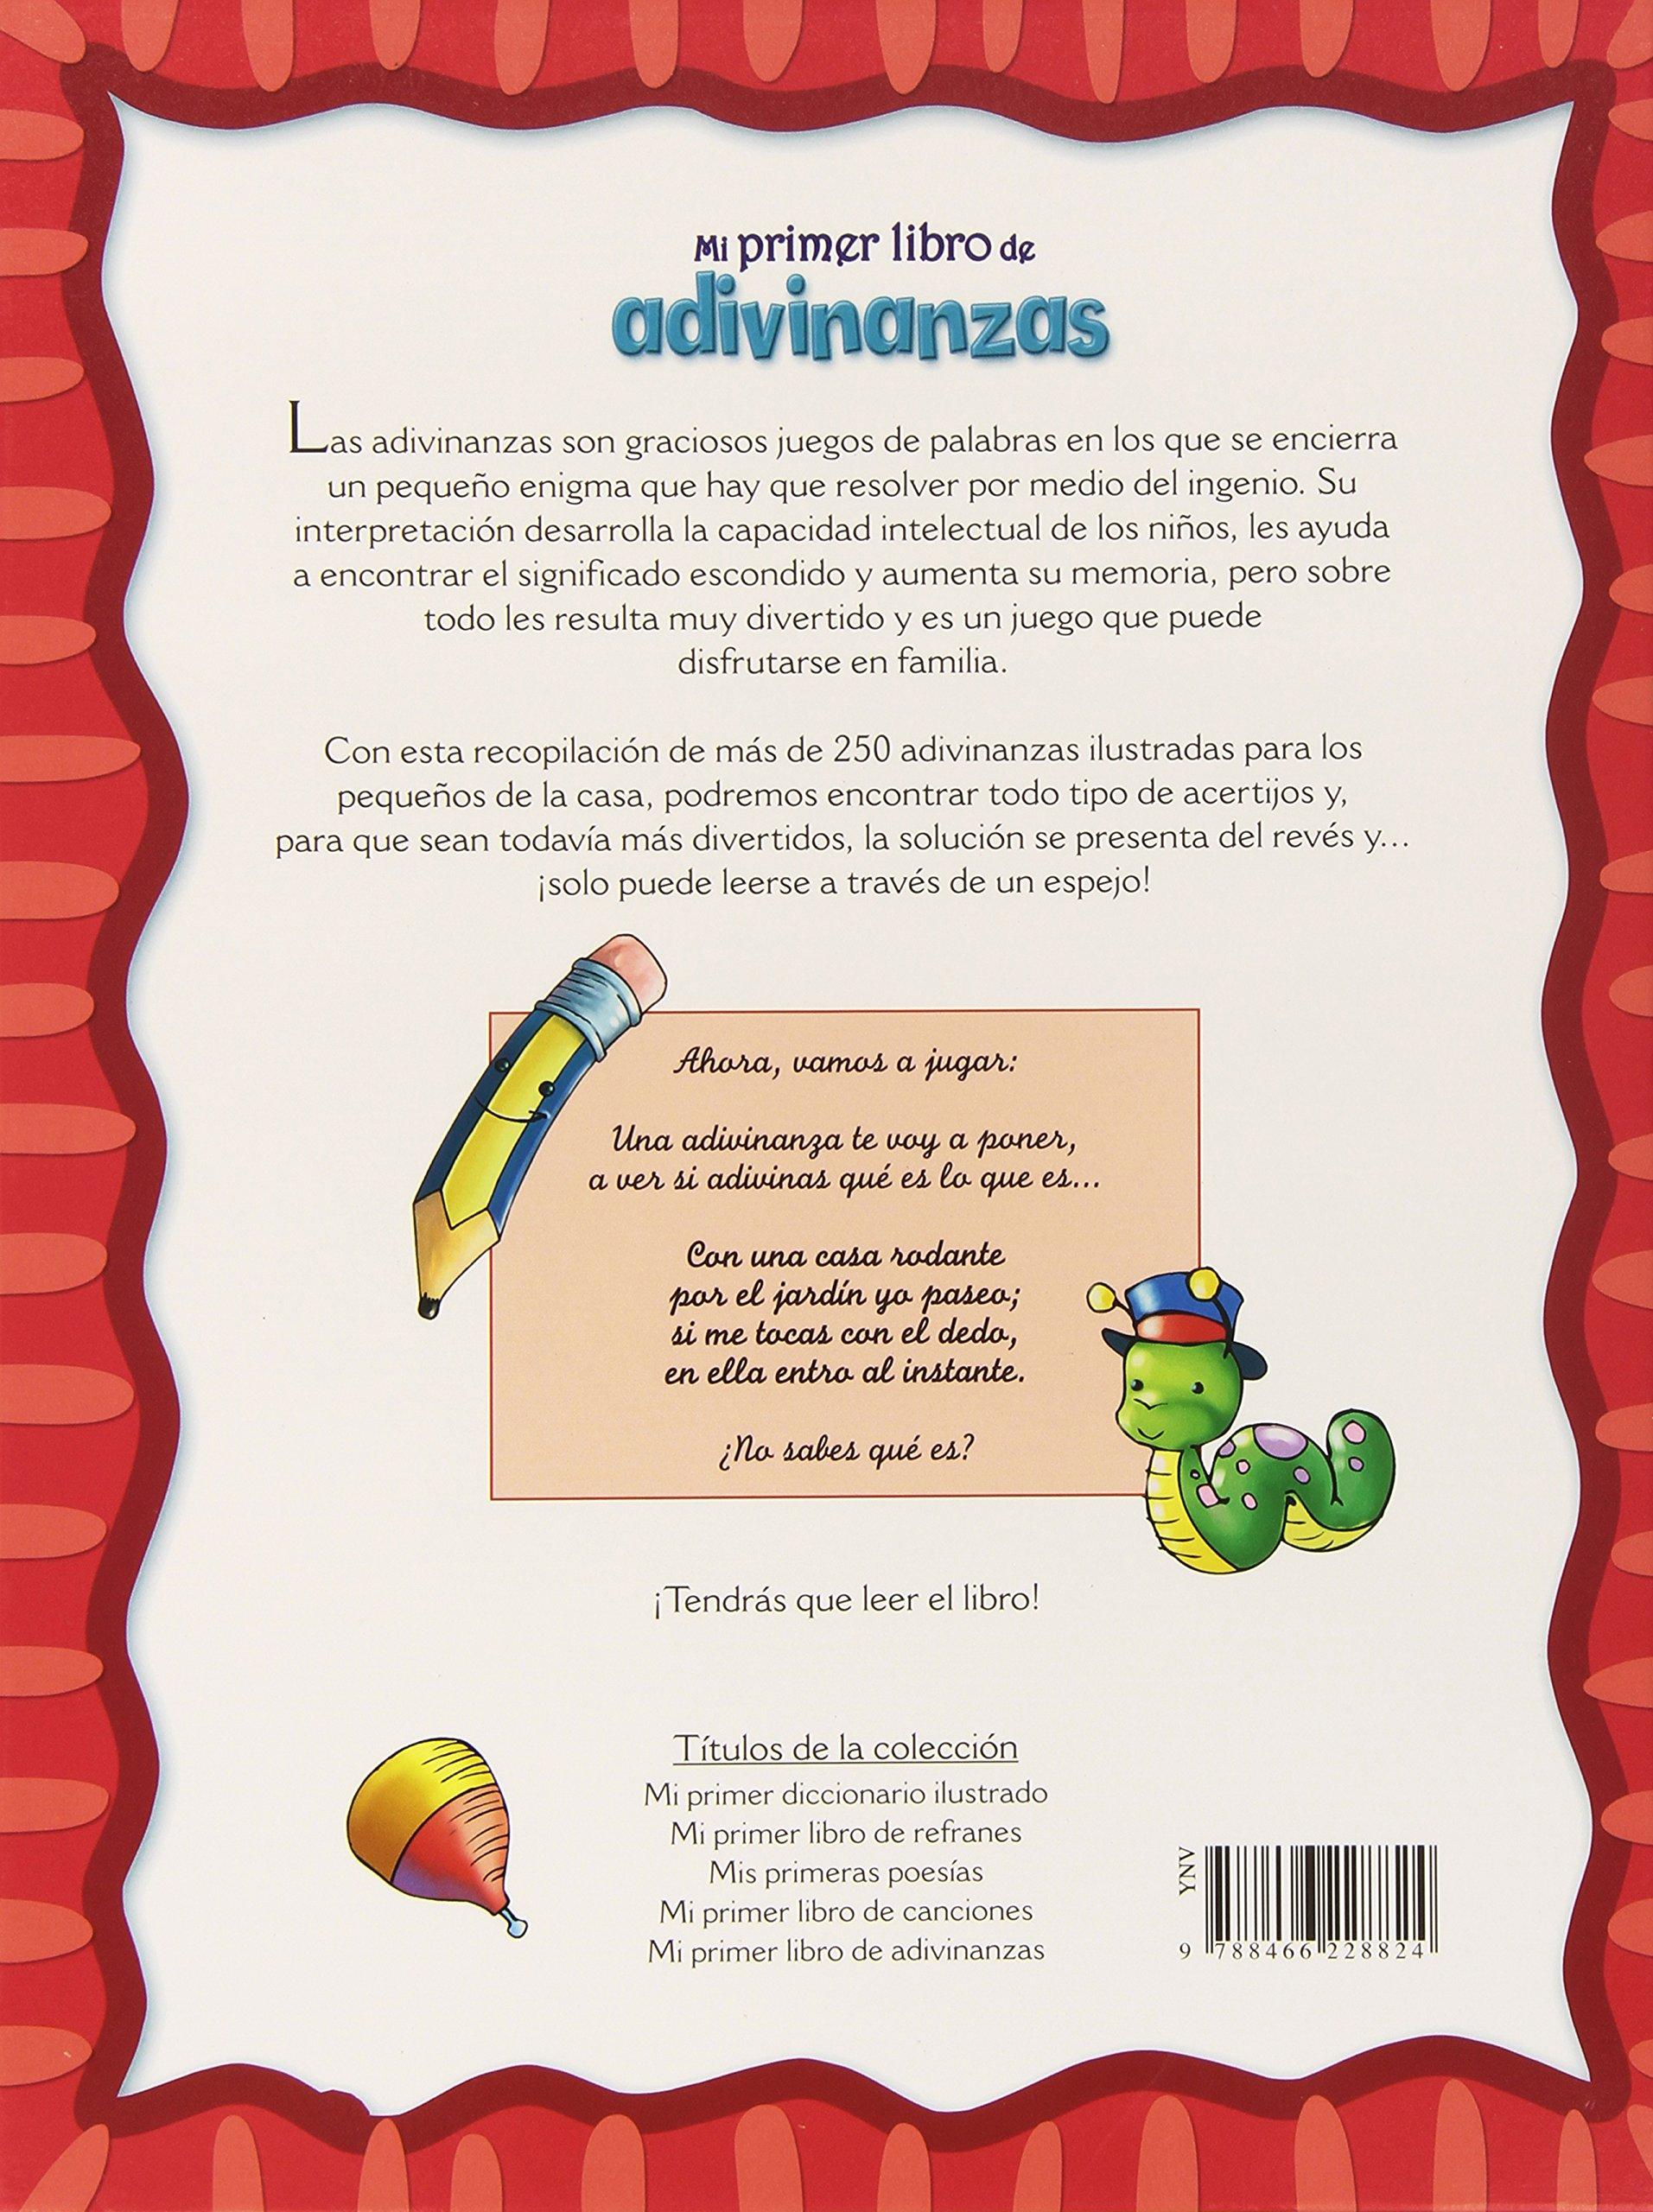 Mi Primer Libro de Adivinanzas (Punto de lectura): Amazon.es: Pérsico, Lucrecia: Libros